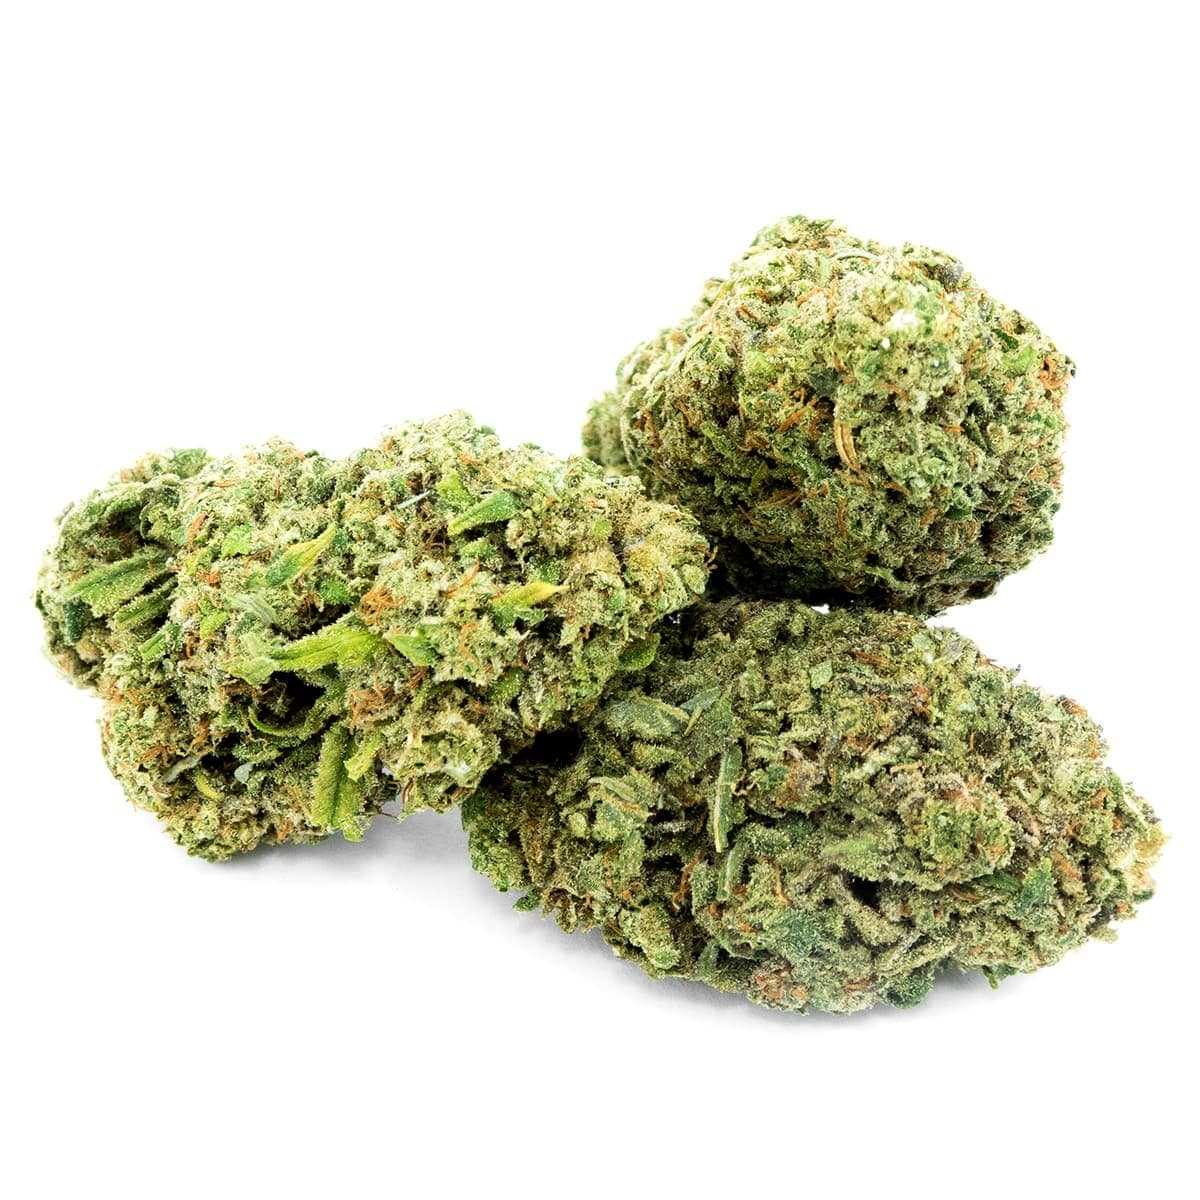 Cannabis Flowers